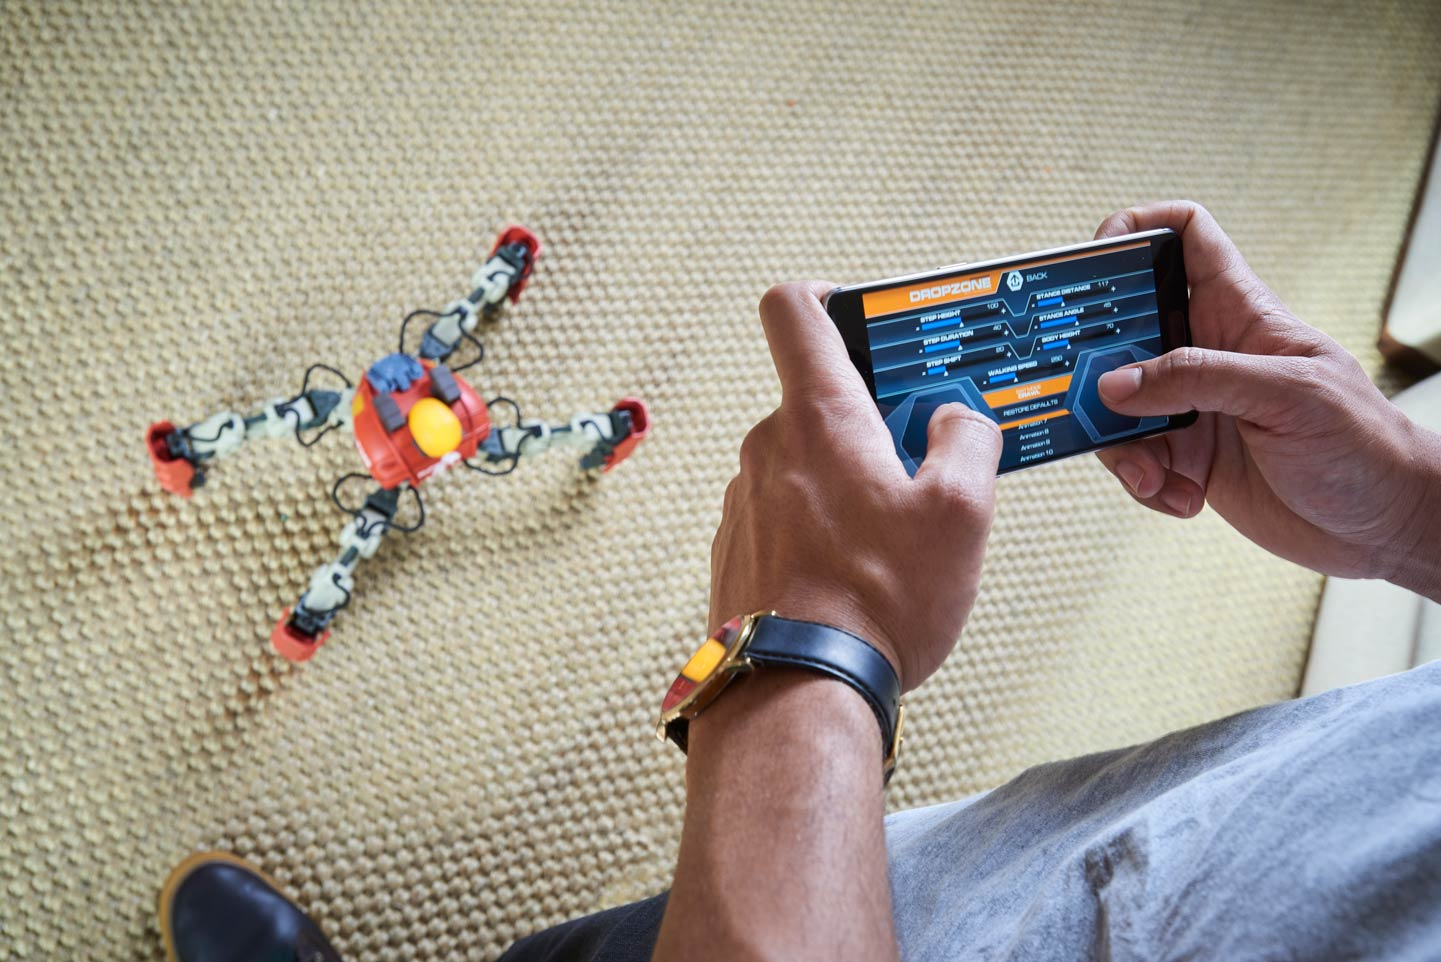 Lab Grown Music Sound Design Music MekaMon Reach Robotics